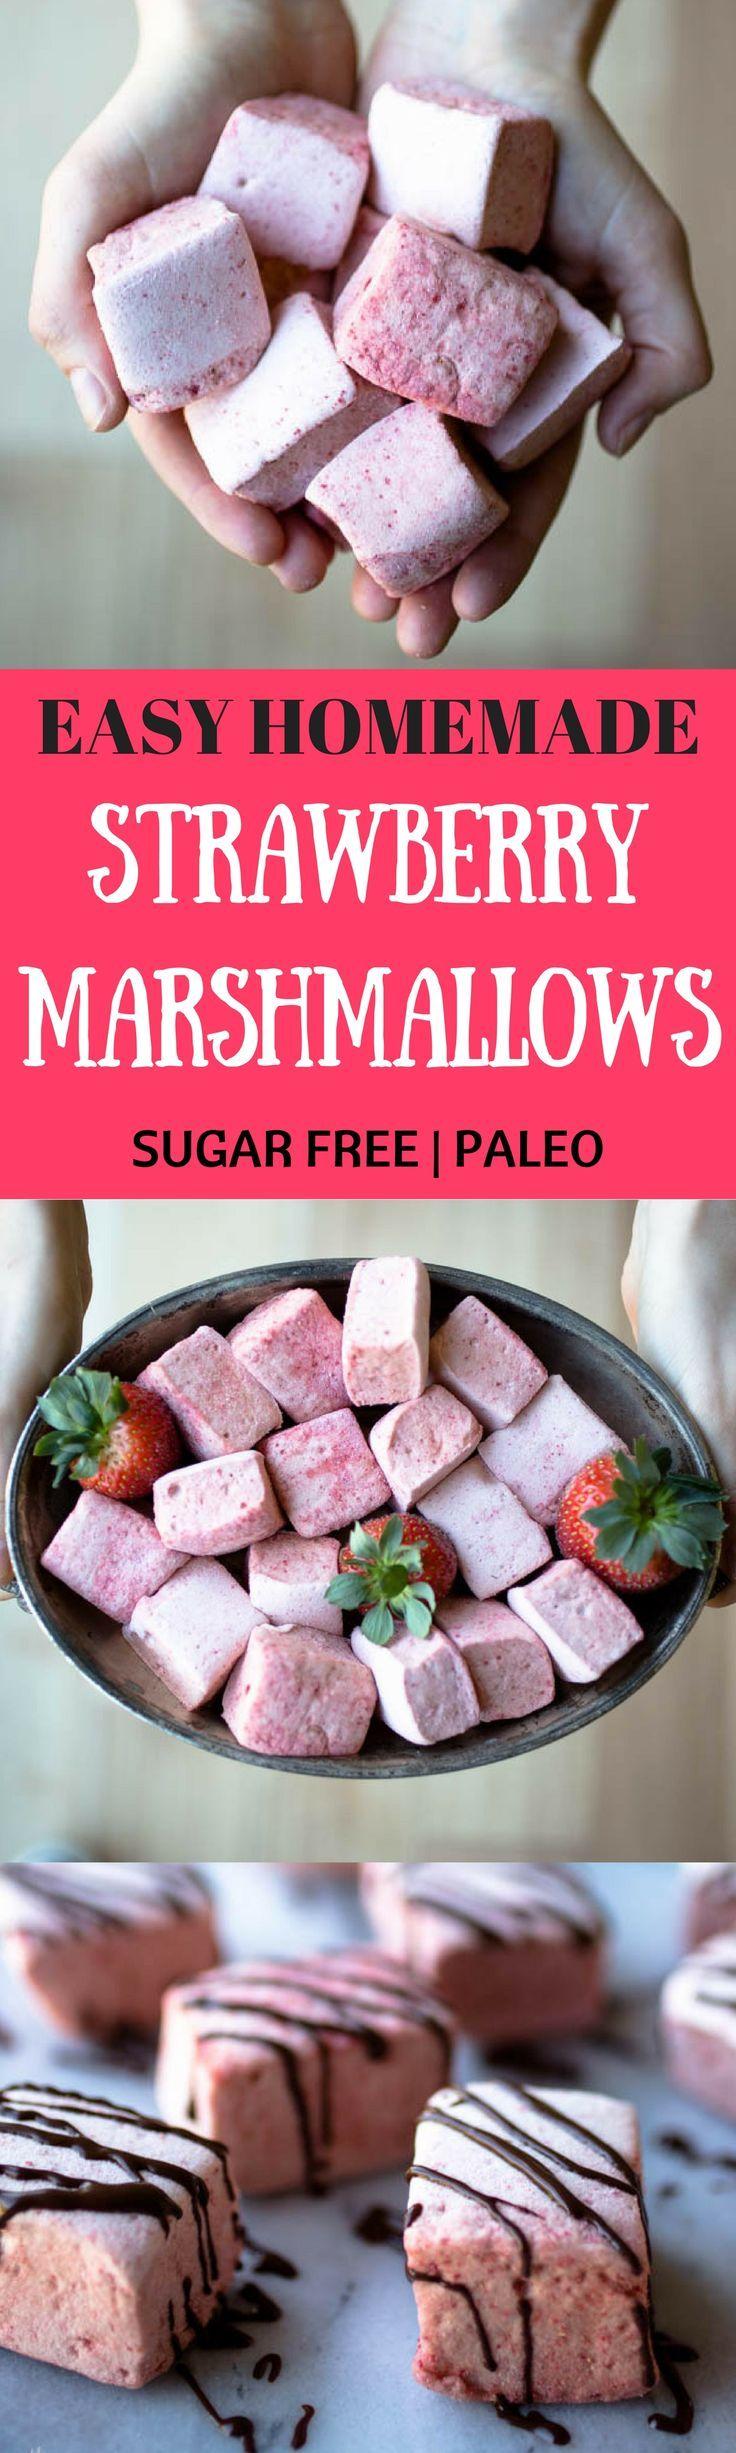 Easy homemade paleo marshmallows! Best Sugar free healthy Marshmallows! Paleo strawberry marshmallows recipe. Easy Paleo gluten free dessert and snack recipe. Healthy paleo candy recipe.